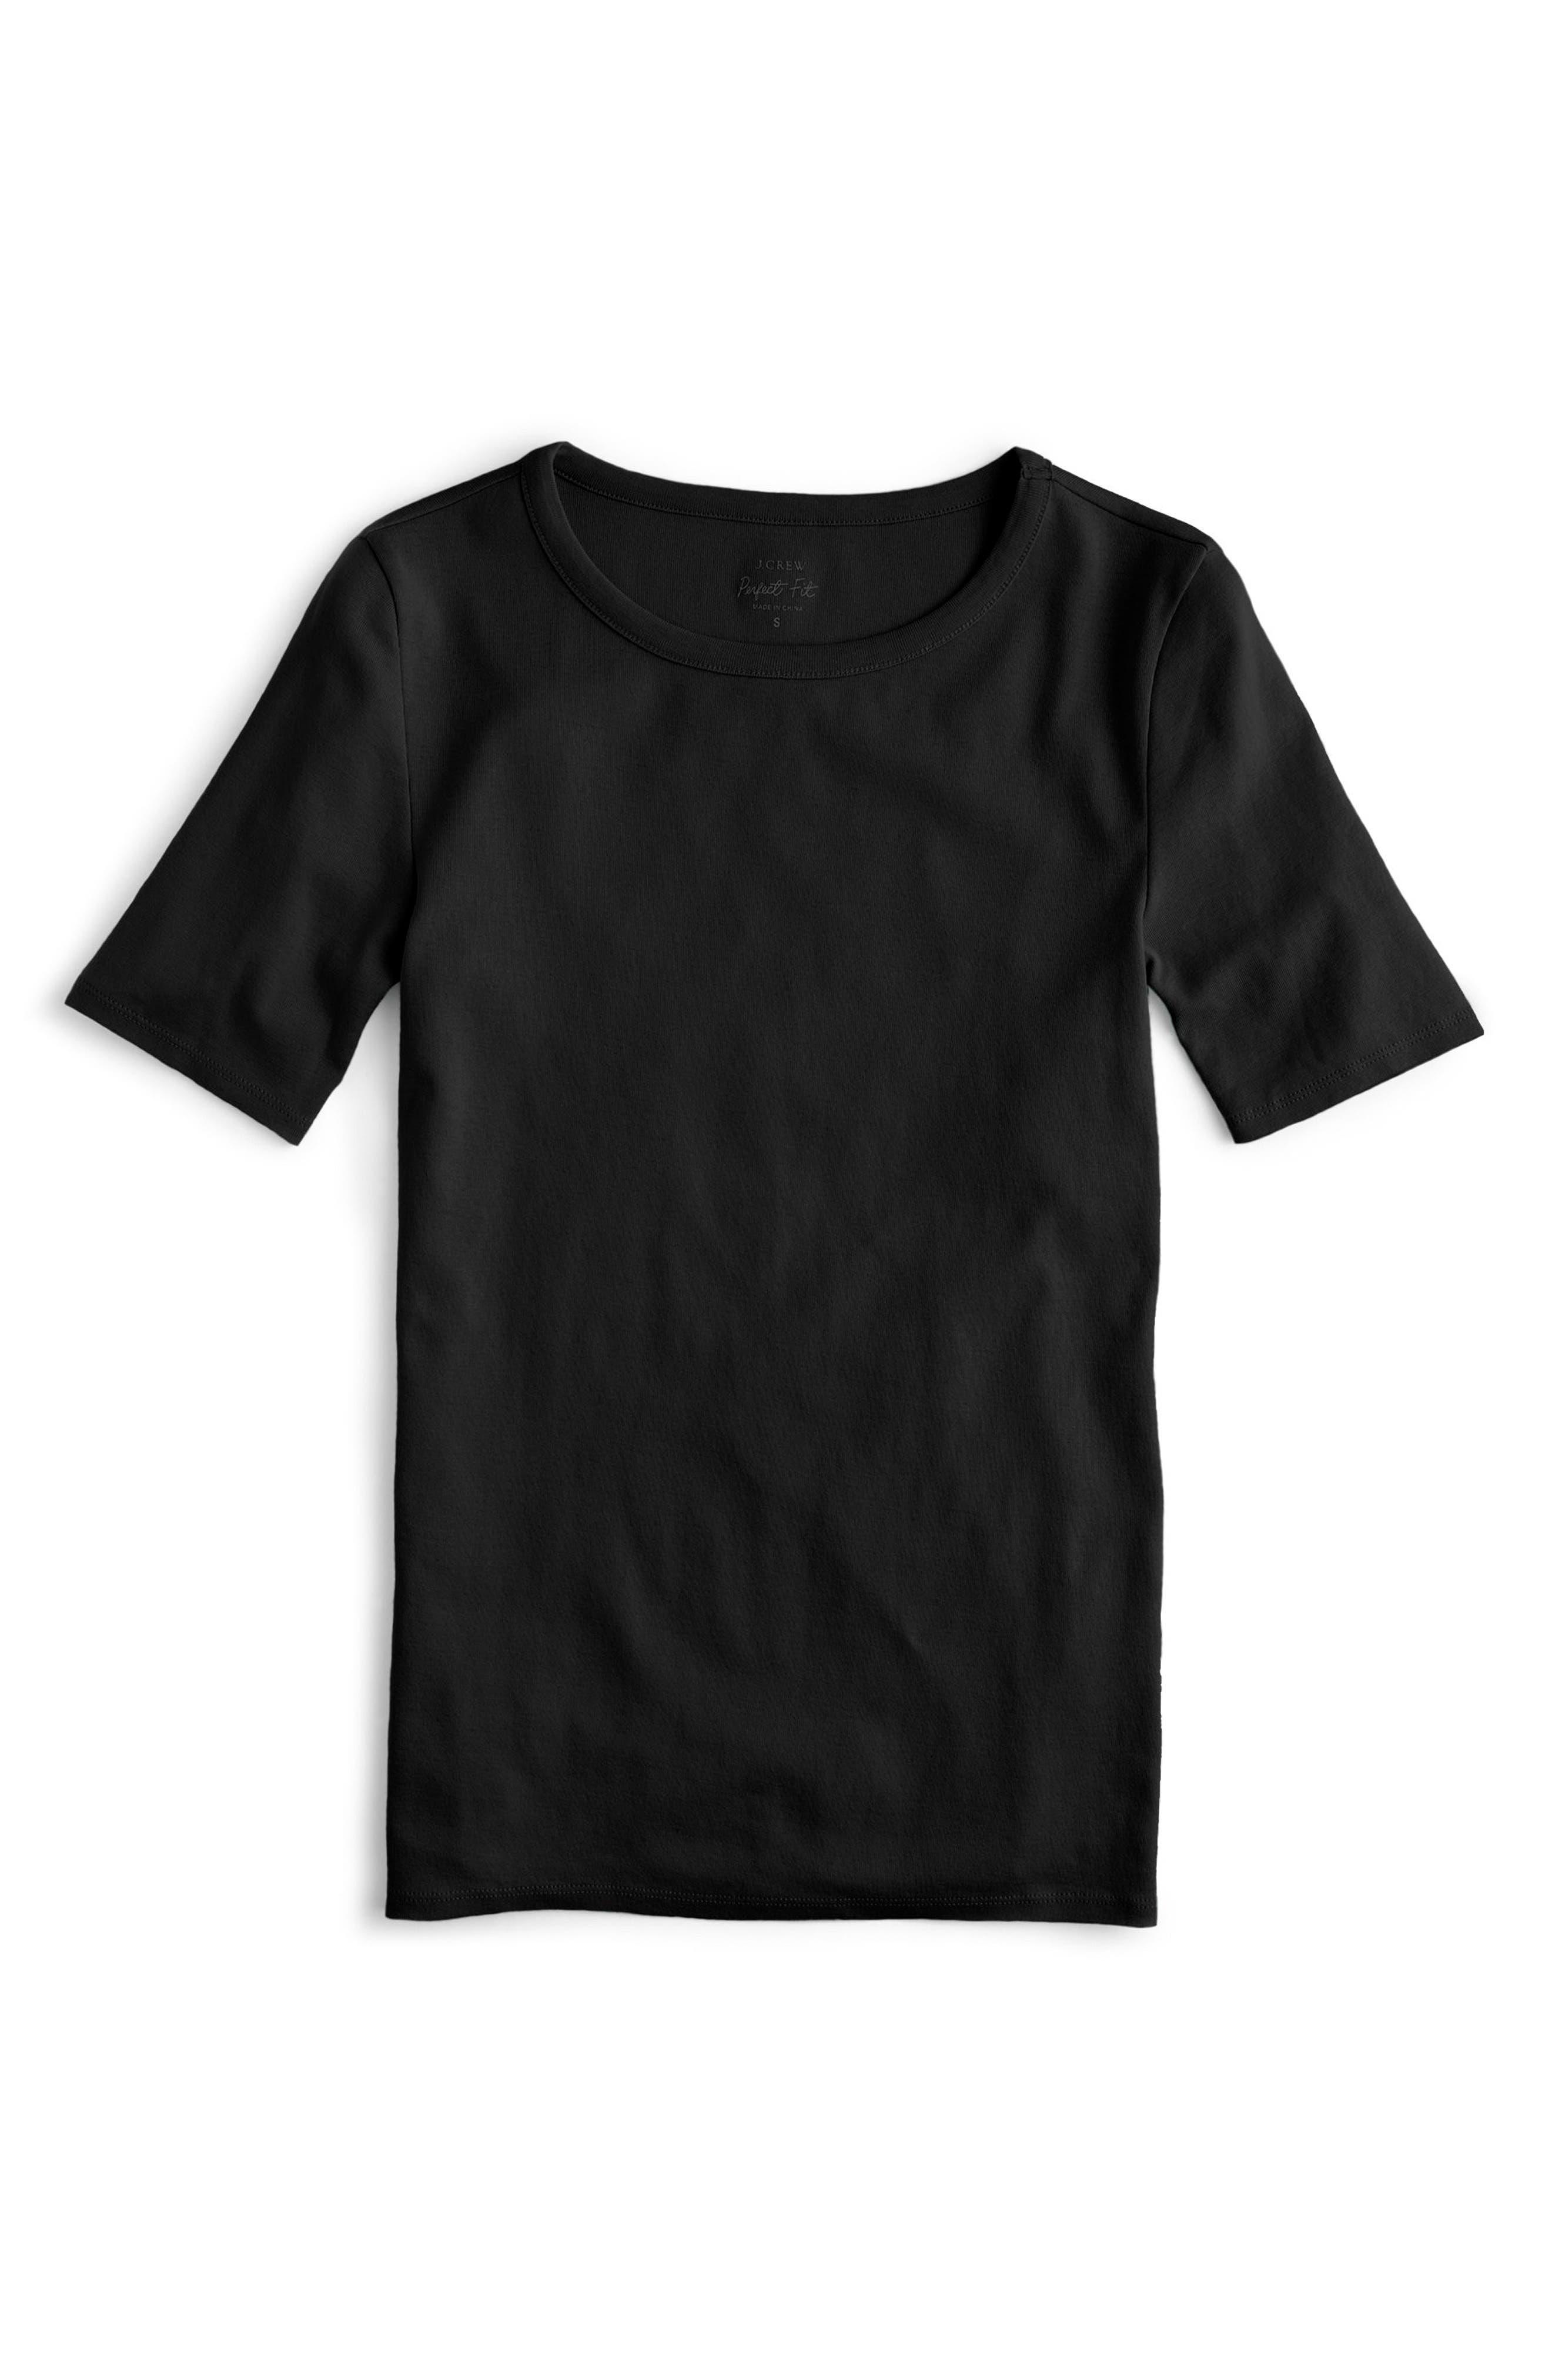 J.Crew New Perfect Fit T-Shirt